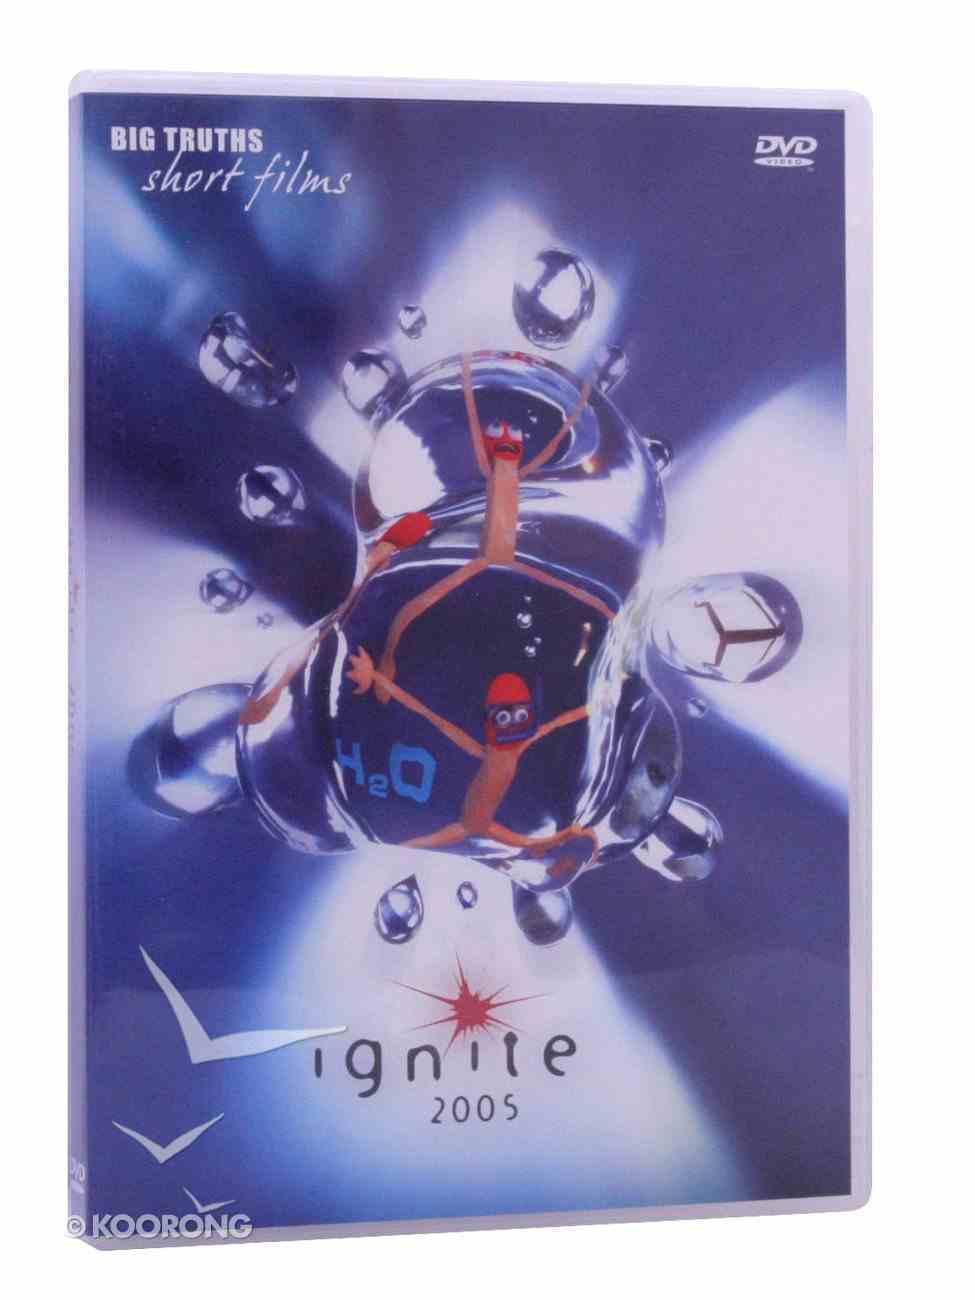 Ignite Film Festival 2005 DVD